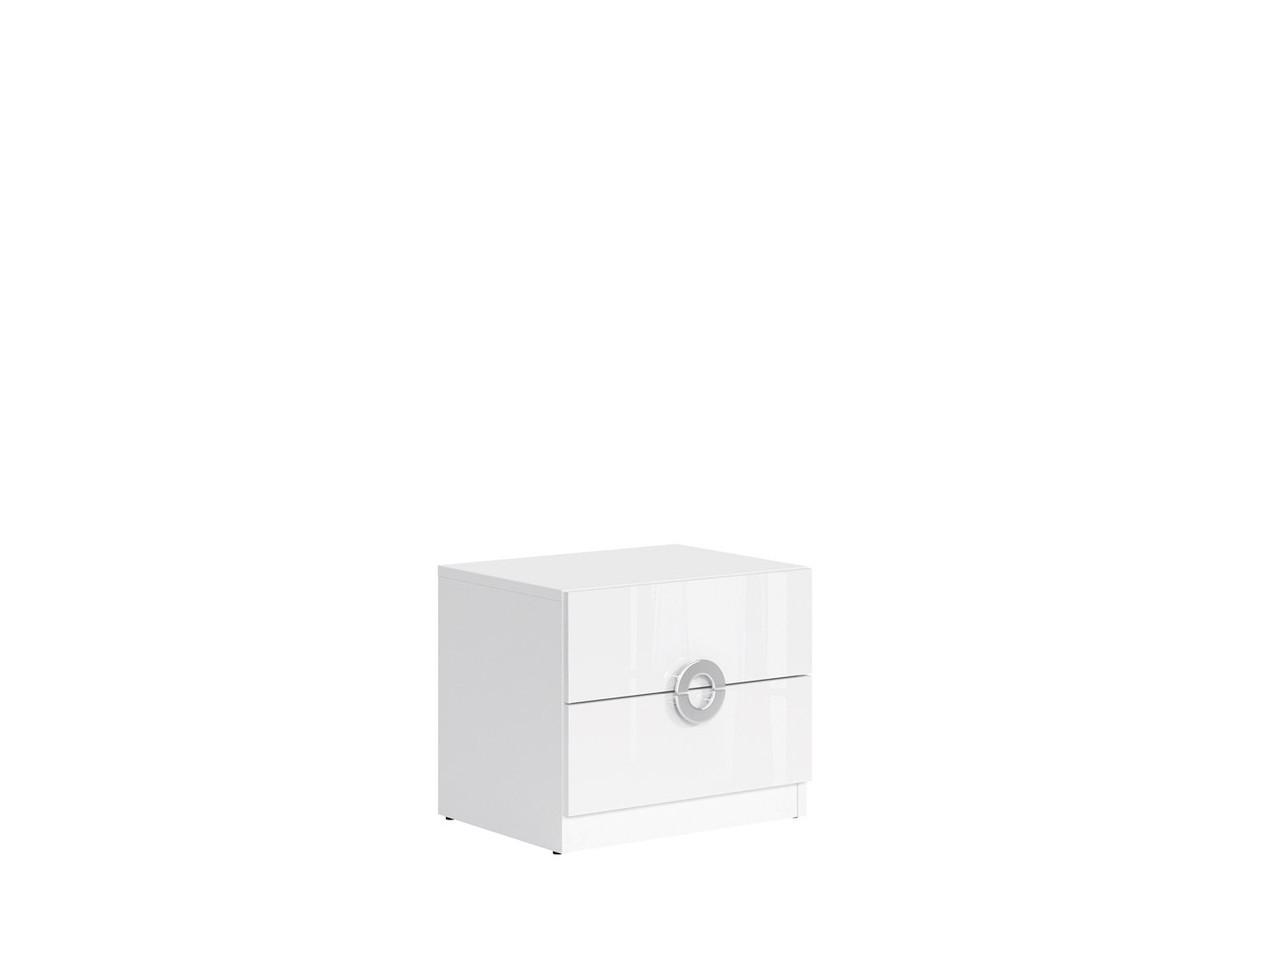 Тумба прикроватная KOM2S/5/4 Ringo BRW белый/белый глянец